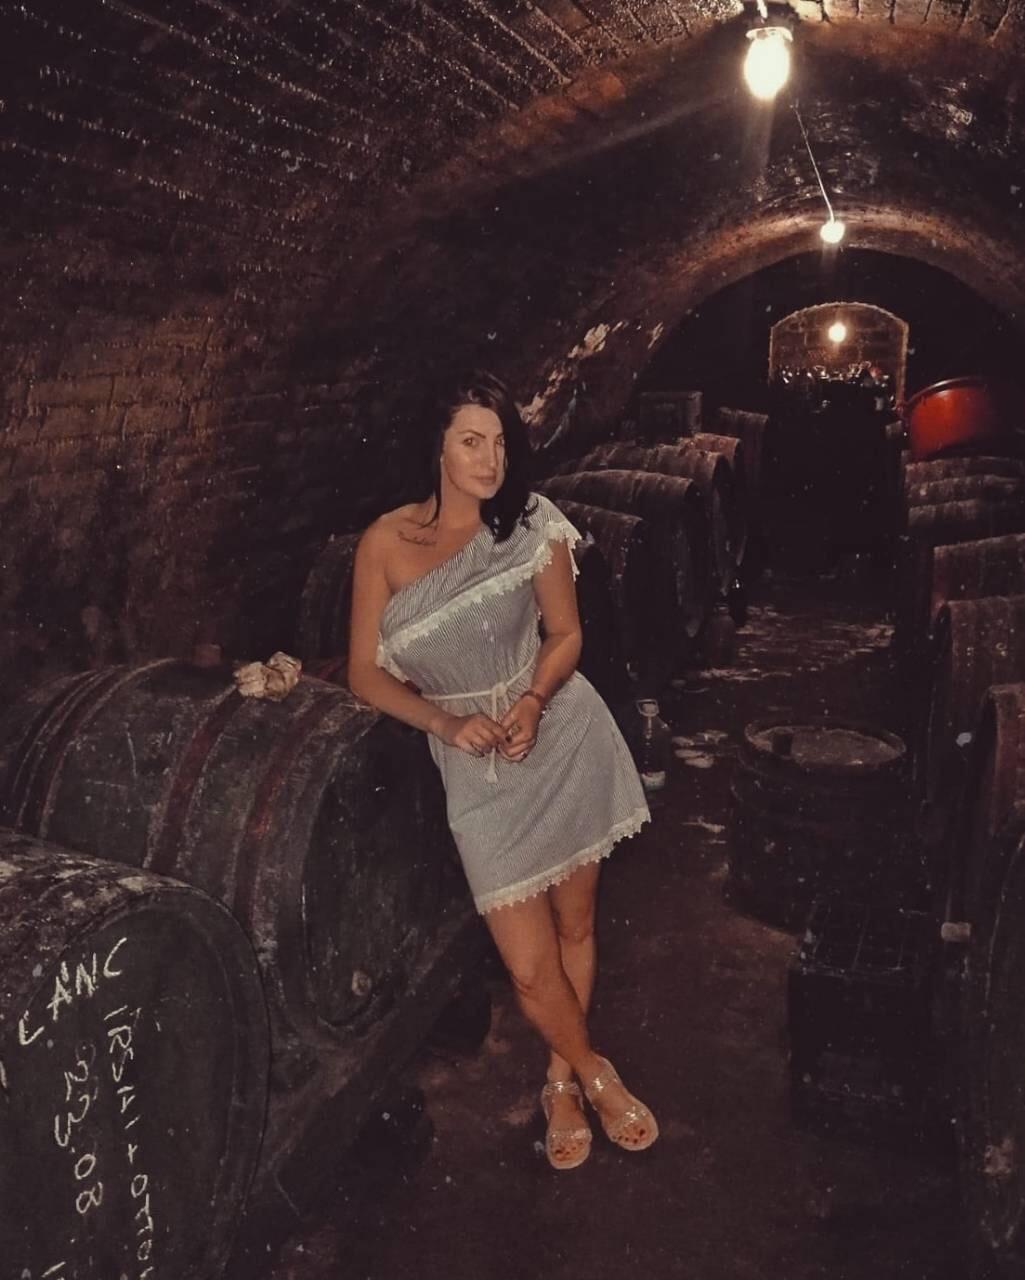 Exploring an old wine cellar.